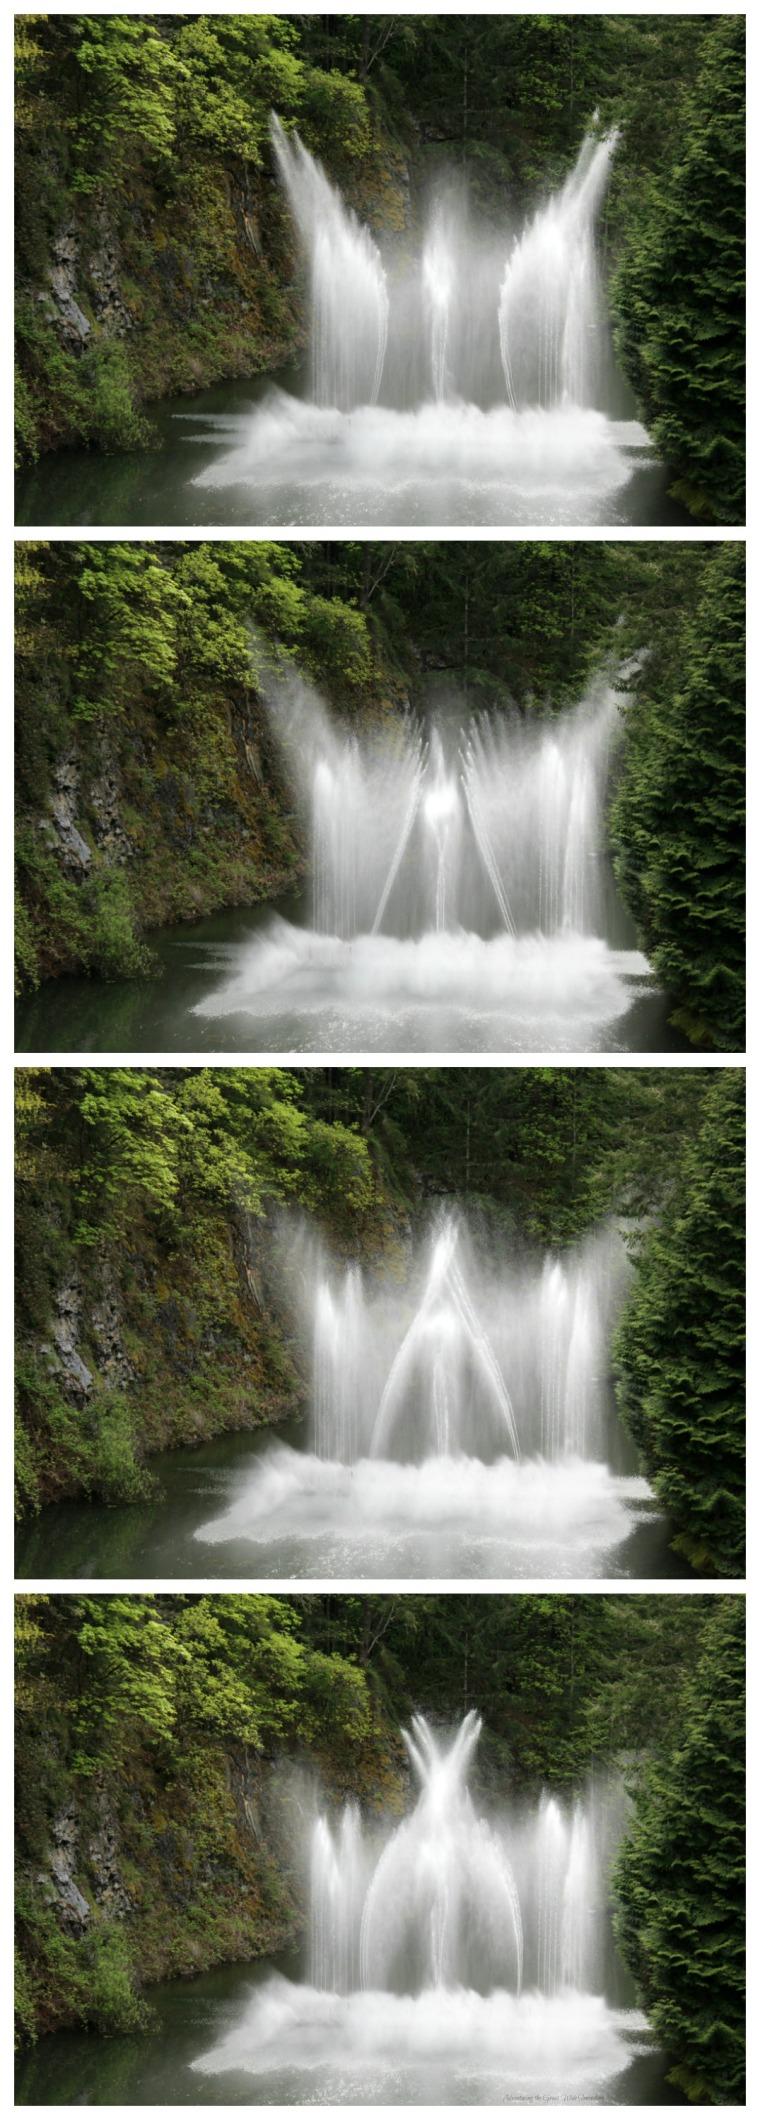 Dancing Fountains at Canada's Butchart Gardens